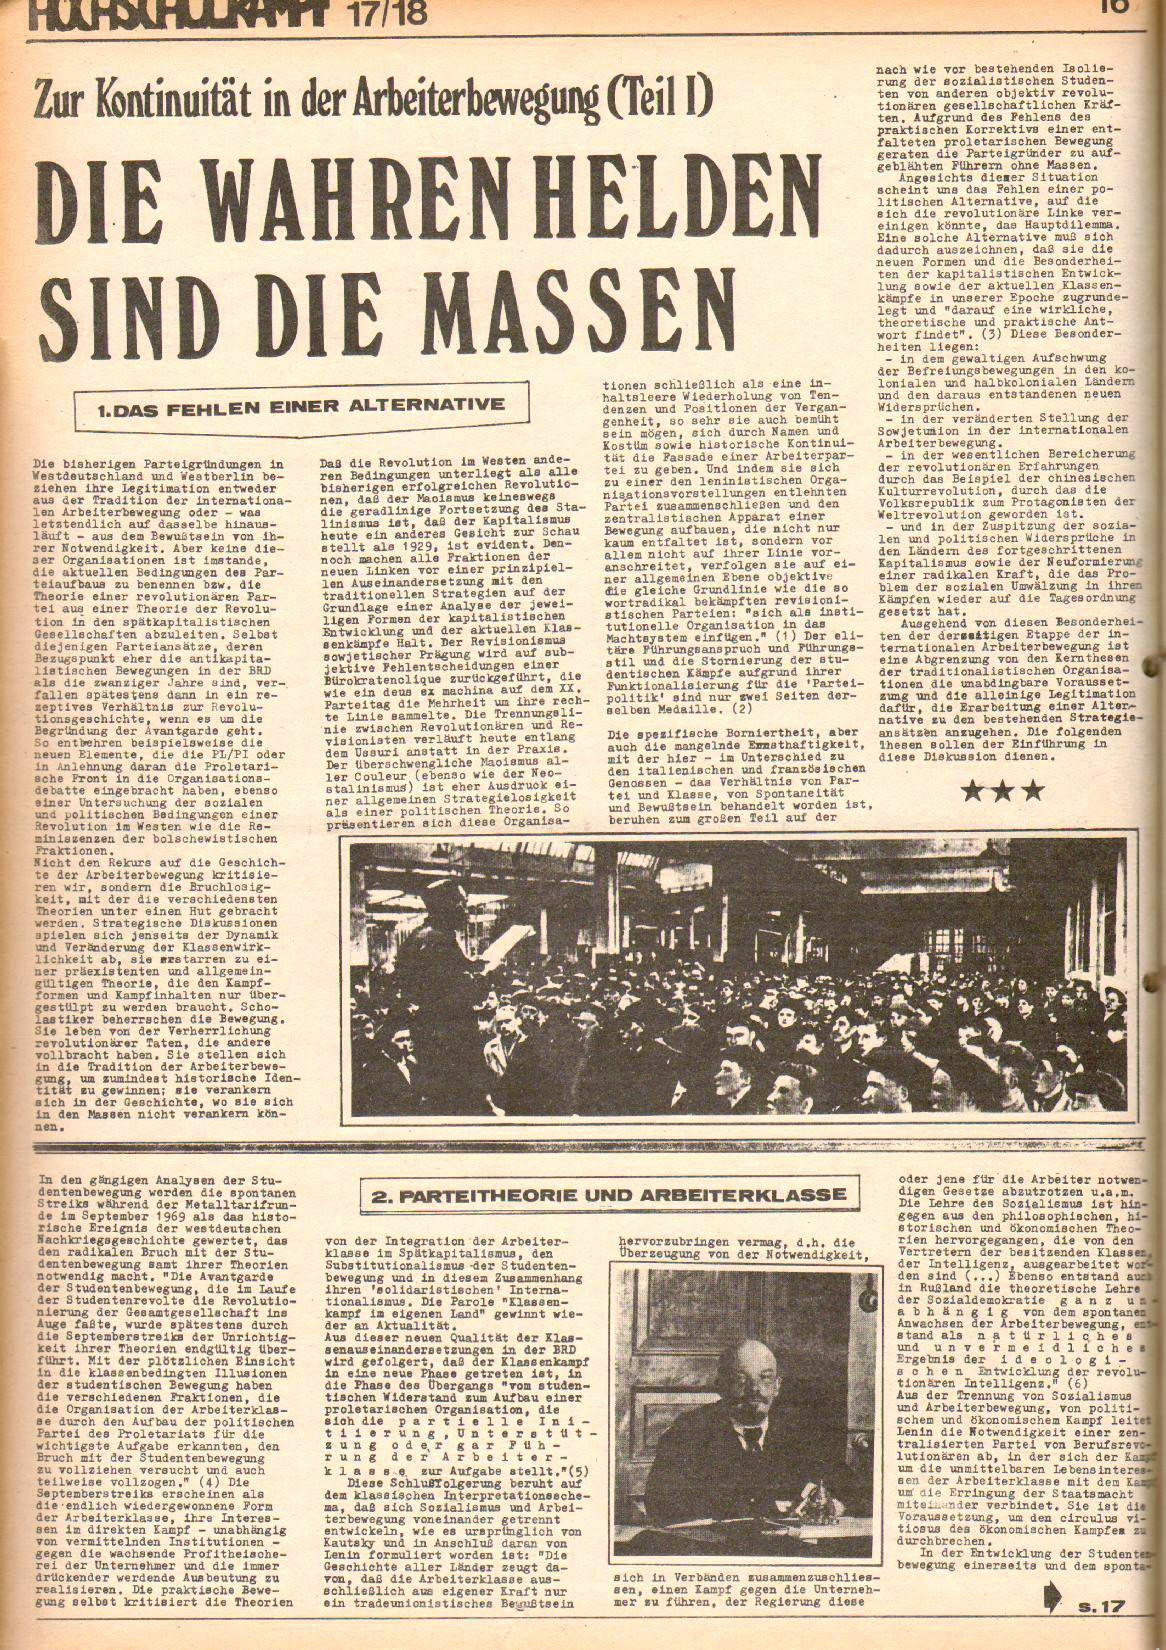 Berlin_Hochschulkampf_1971_17_16